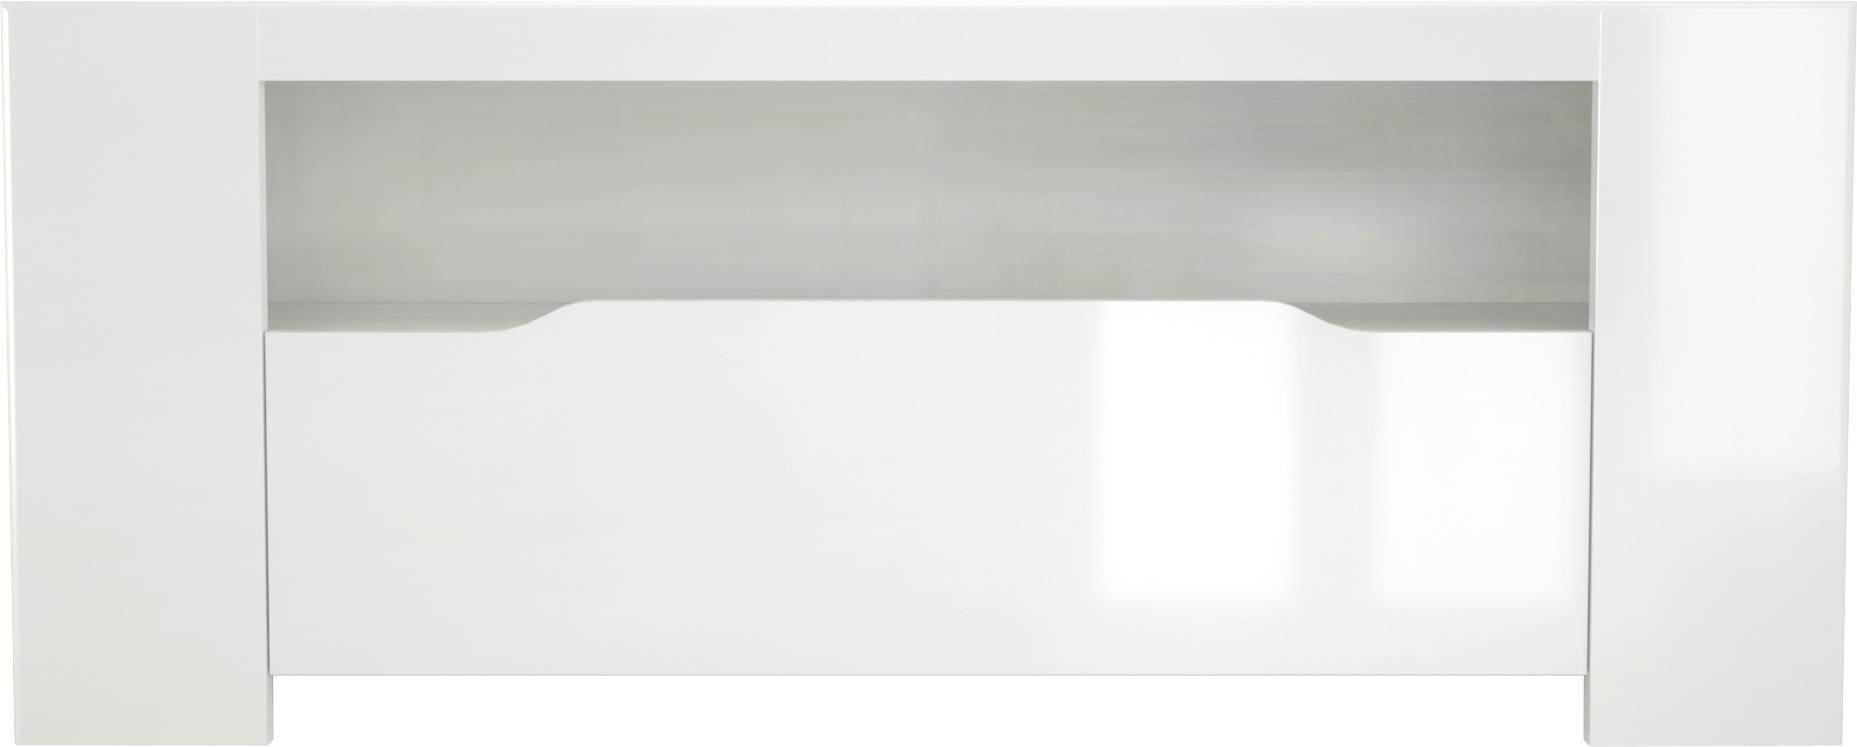 INOSIGN TV Lowboard Orlando inklusive Beleuchtung Breite 118 cm